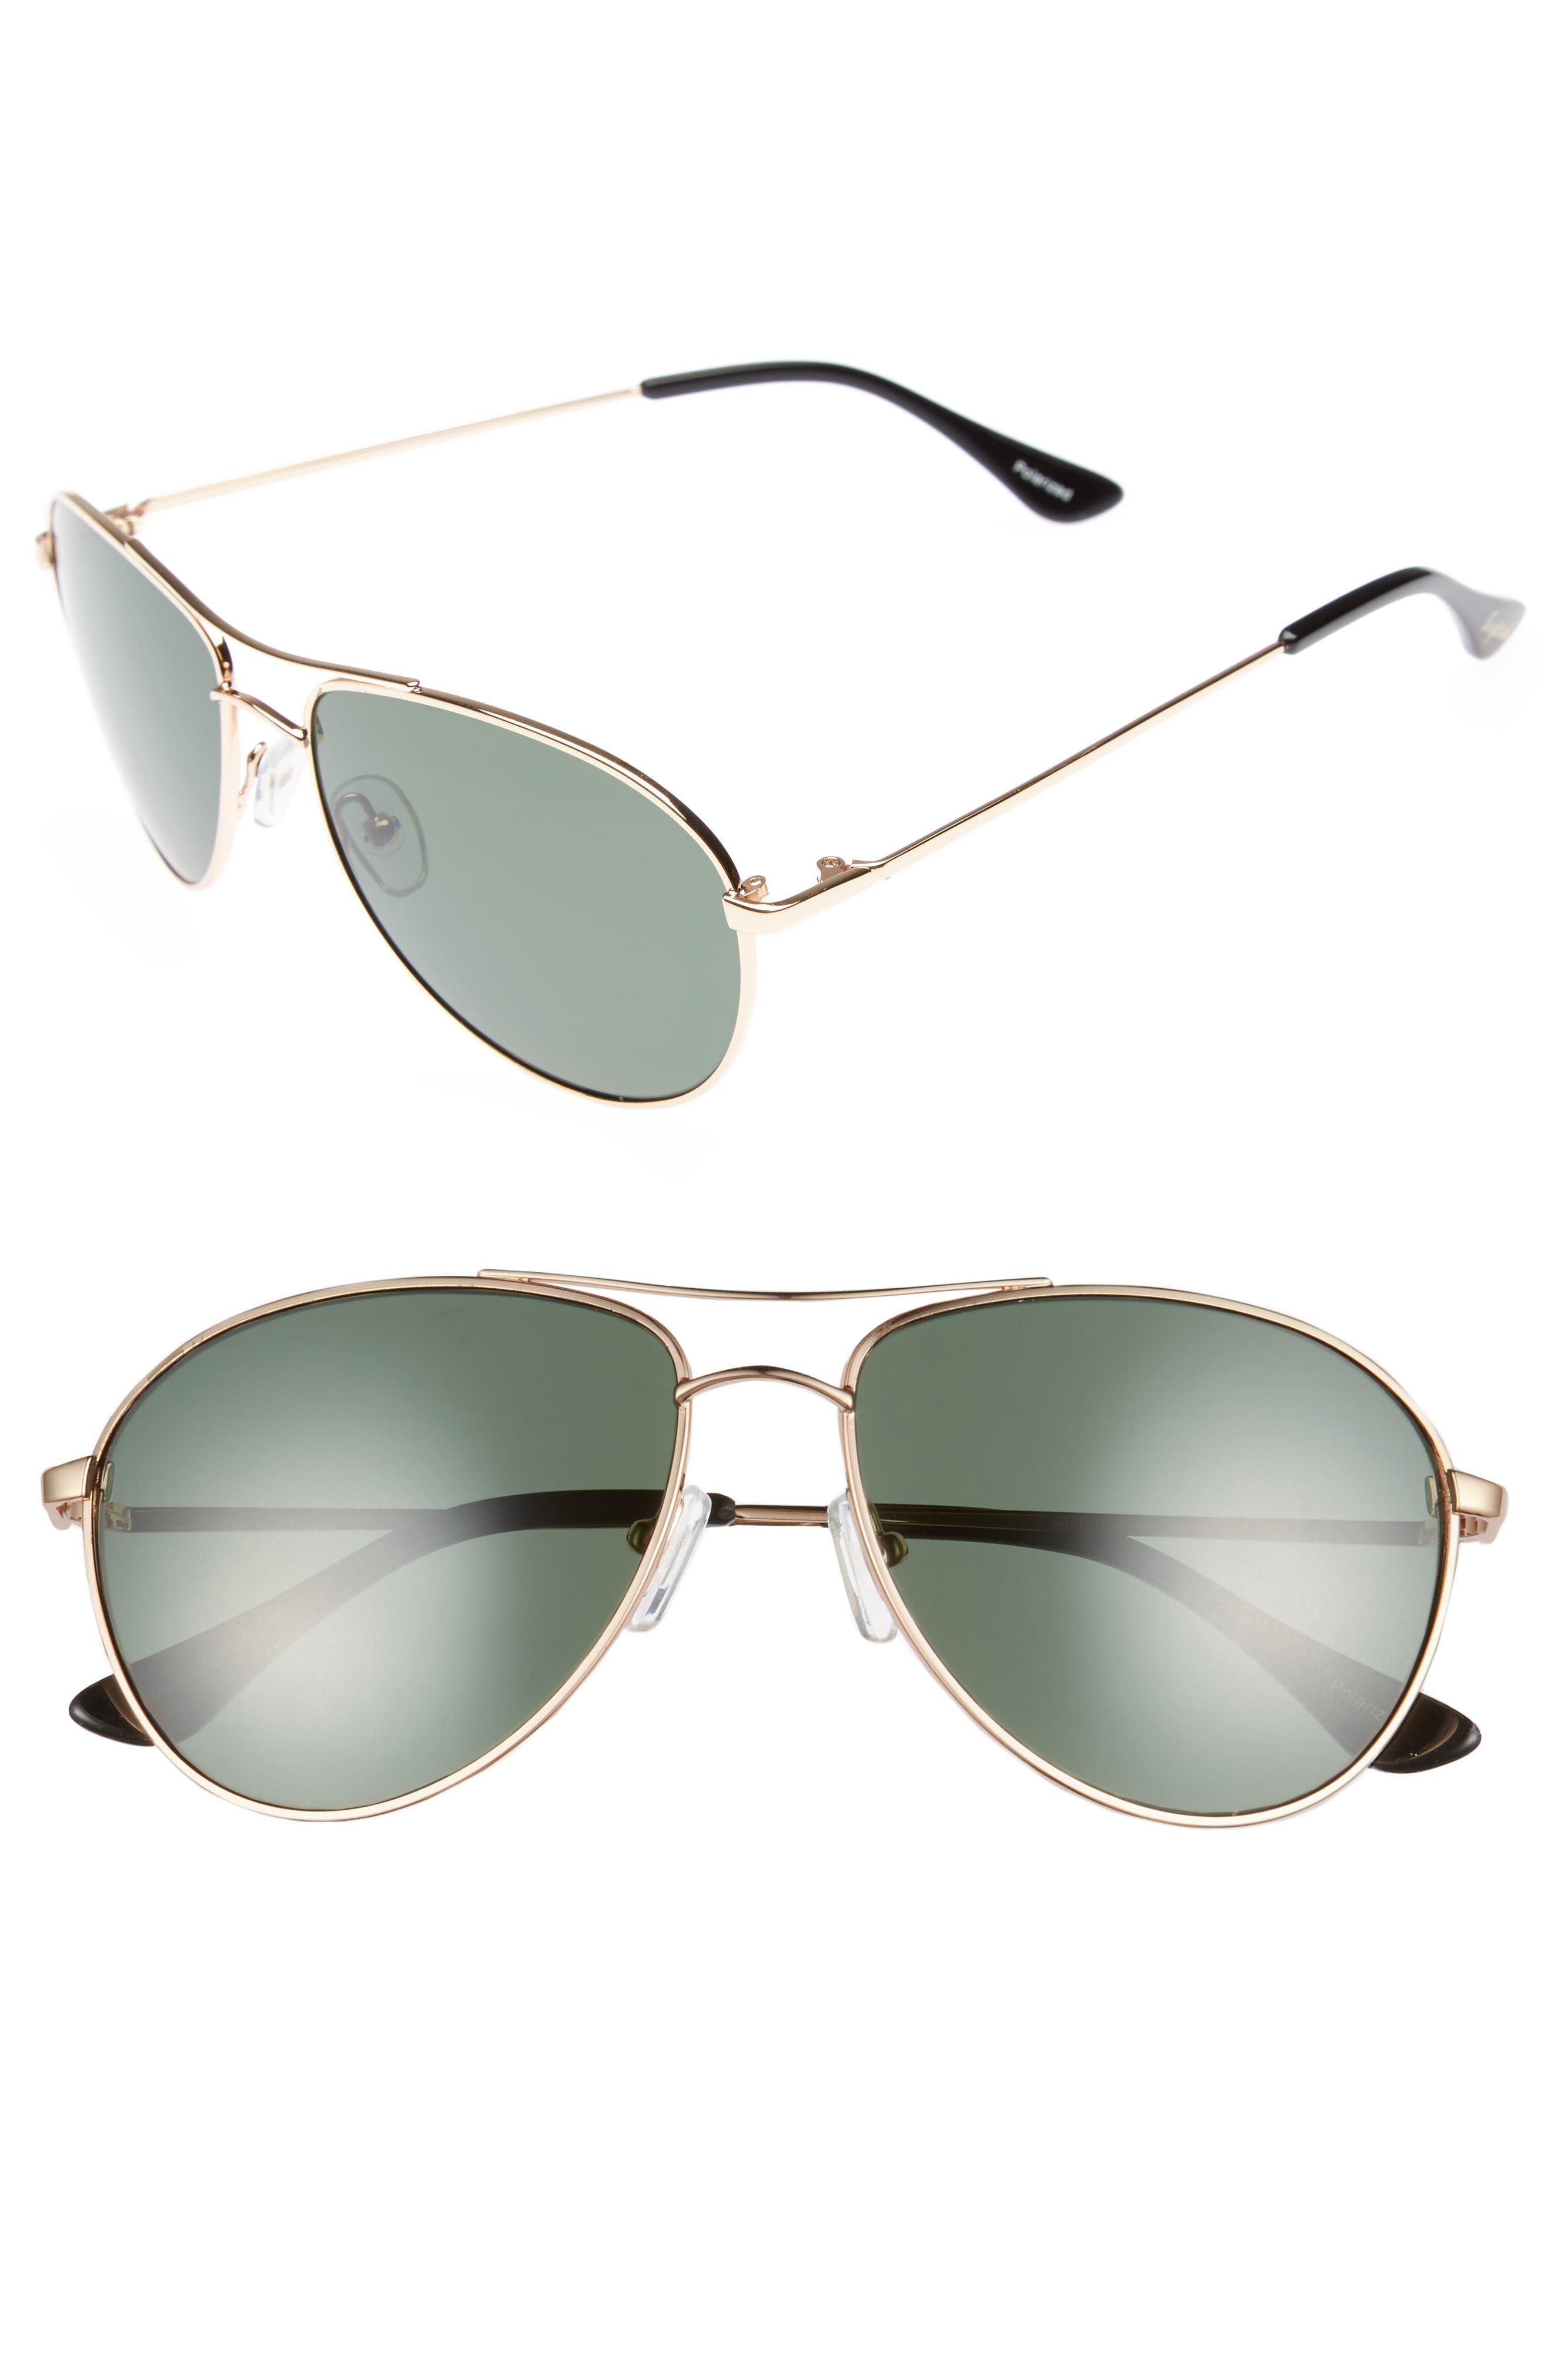 Orville 58mm Polarized Aviator Sunglasses,                             Main thumbnail 2, color,